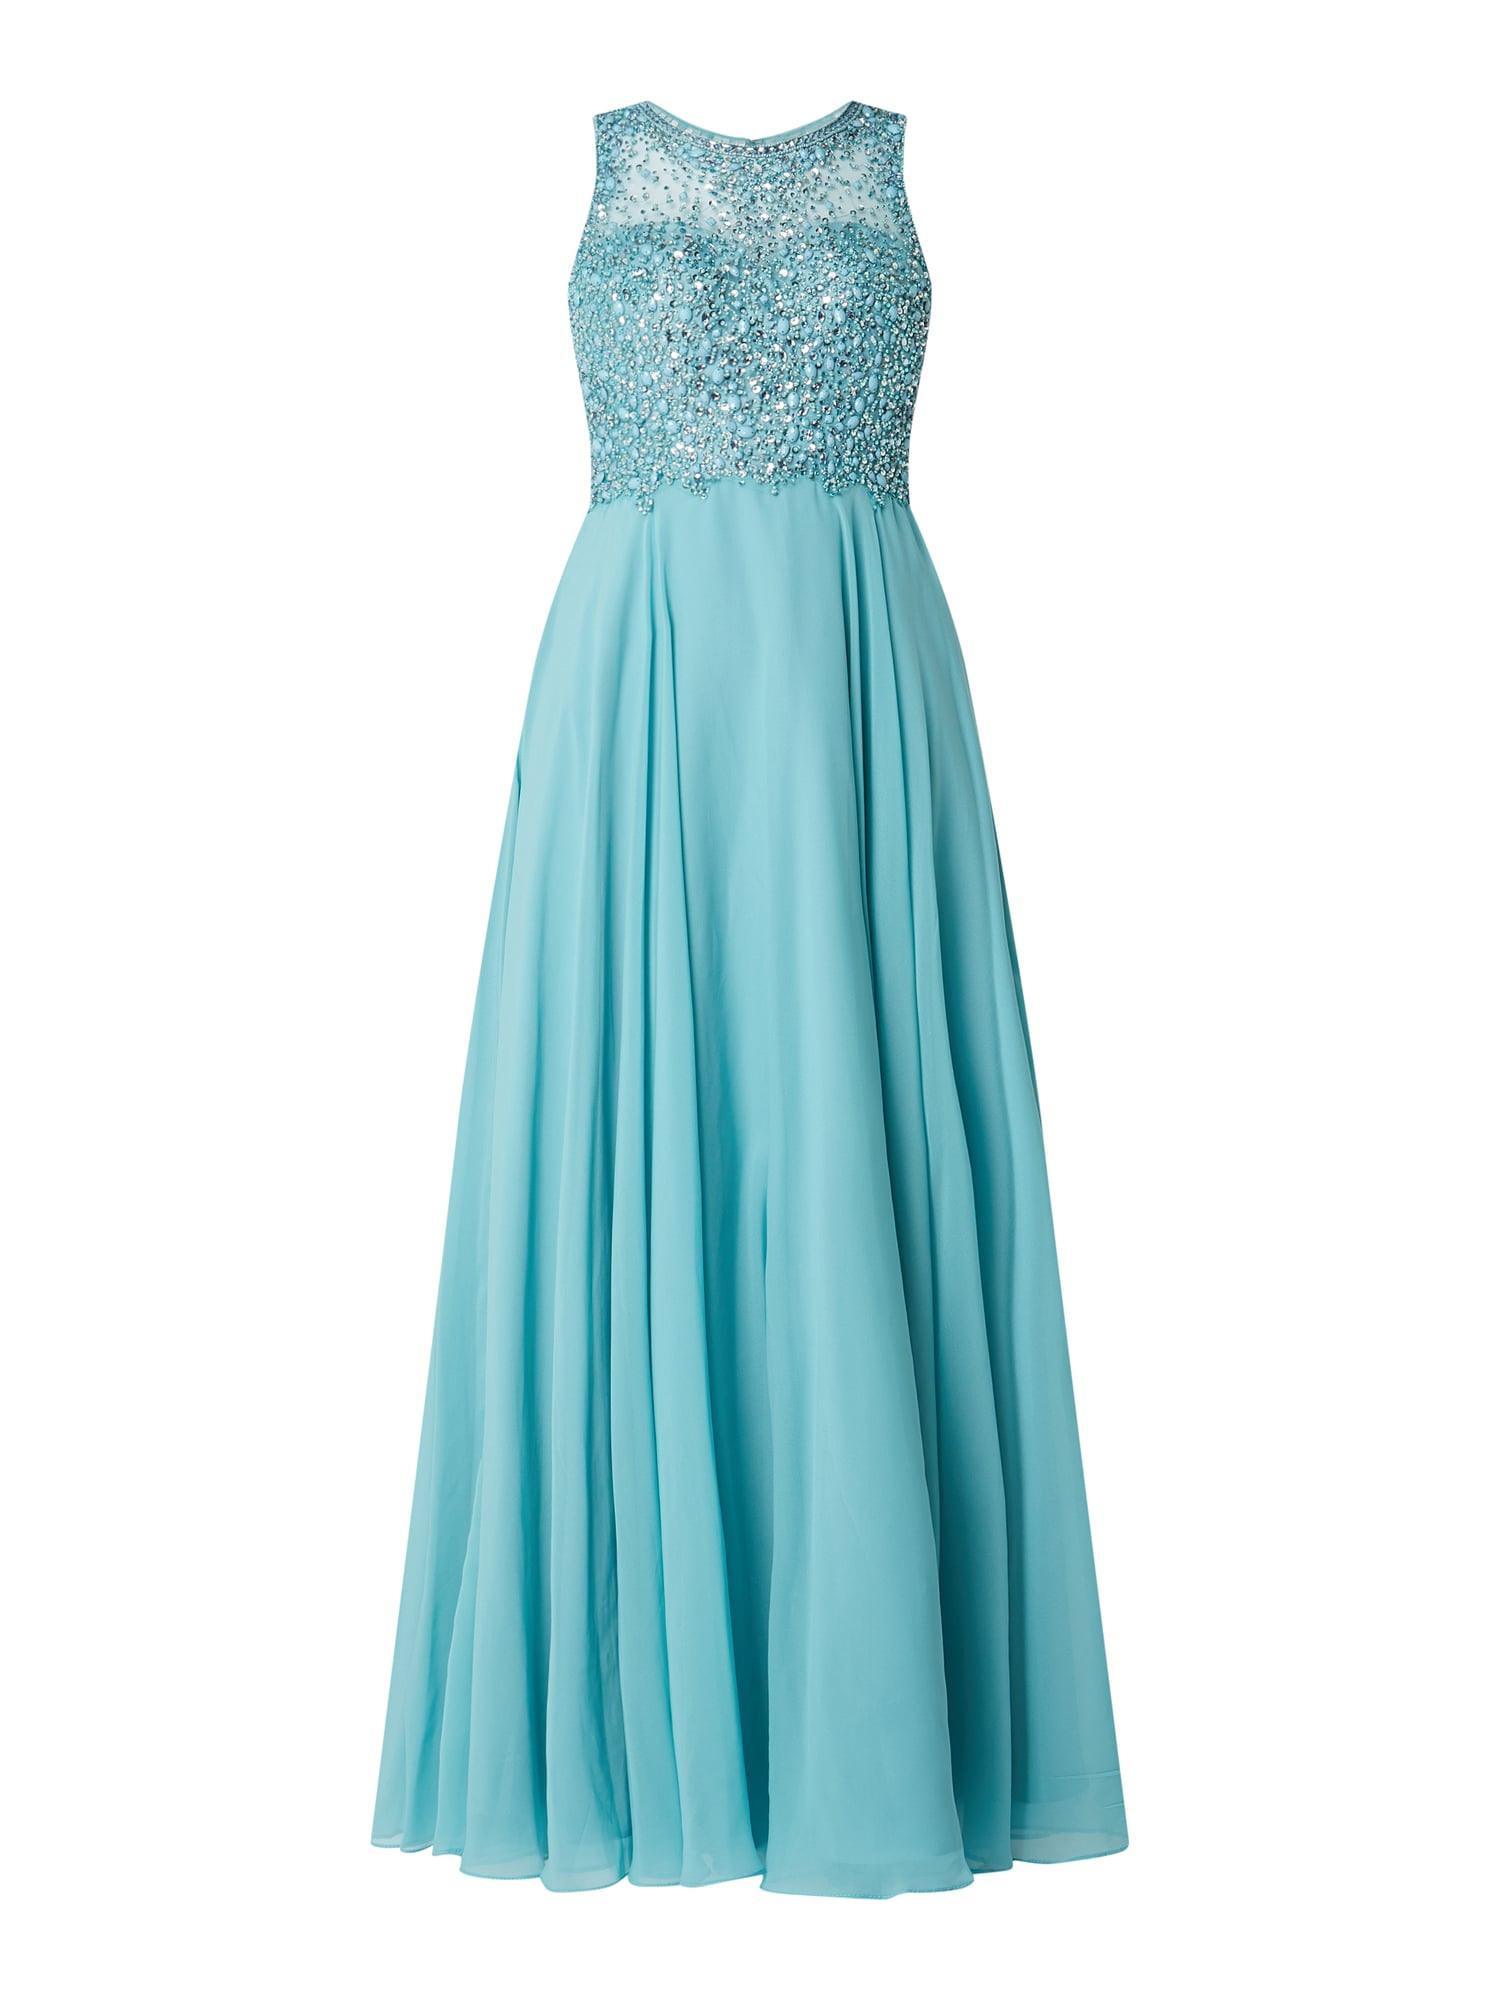 Abend Leicht Unique Abendkleid Blau VertriebDesigner Ausgezeichnet Unique Abendkleid Blau Vertrieb